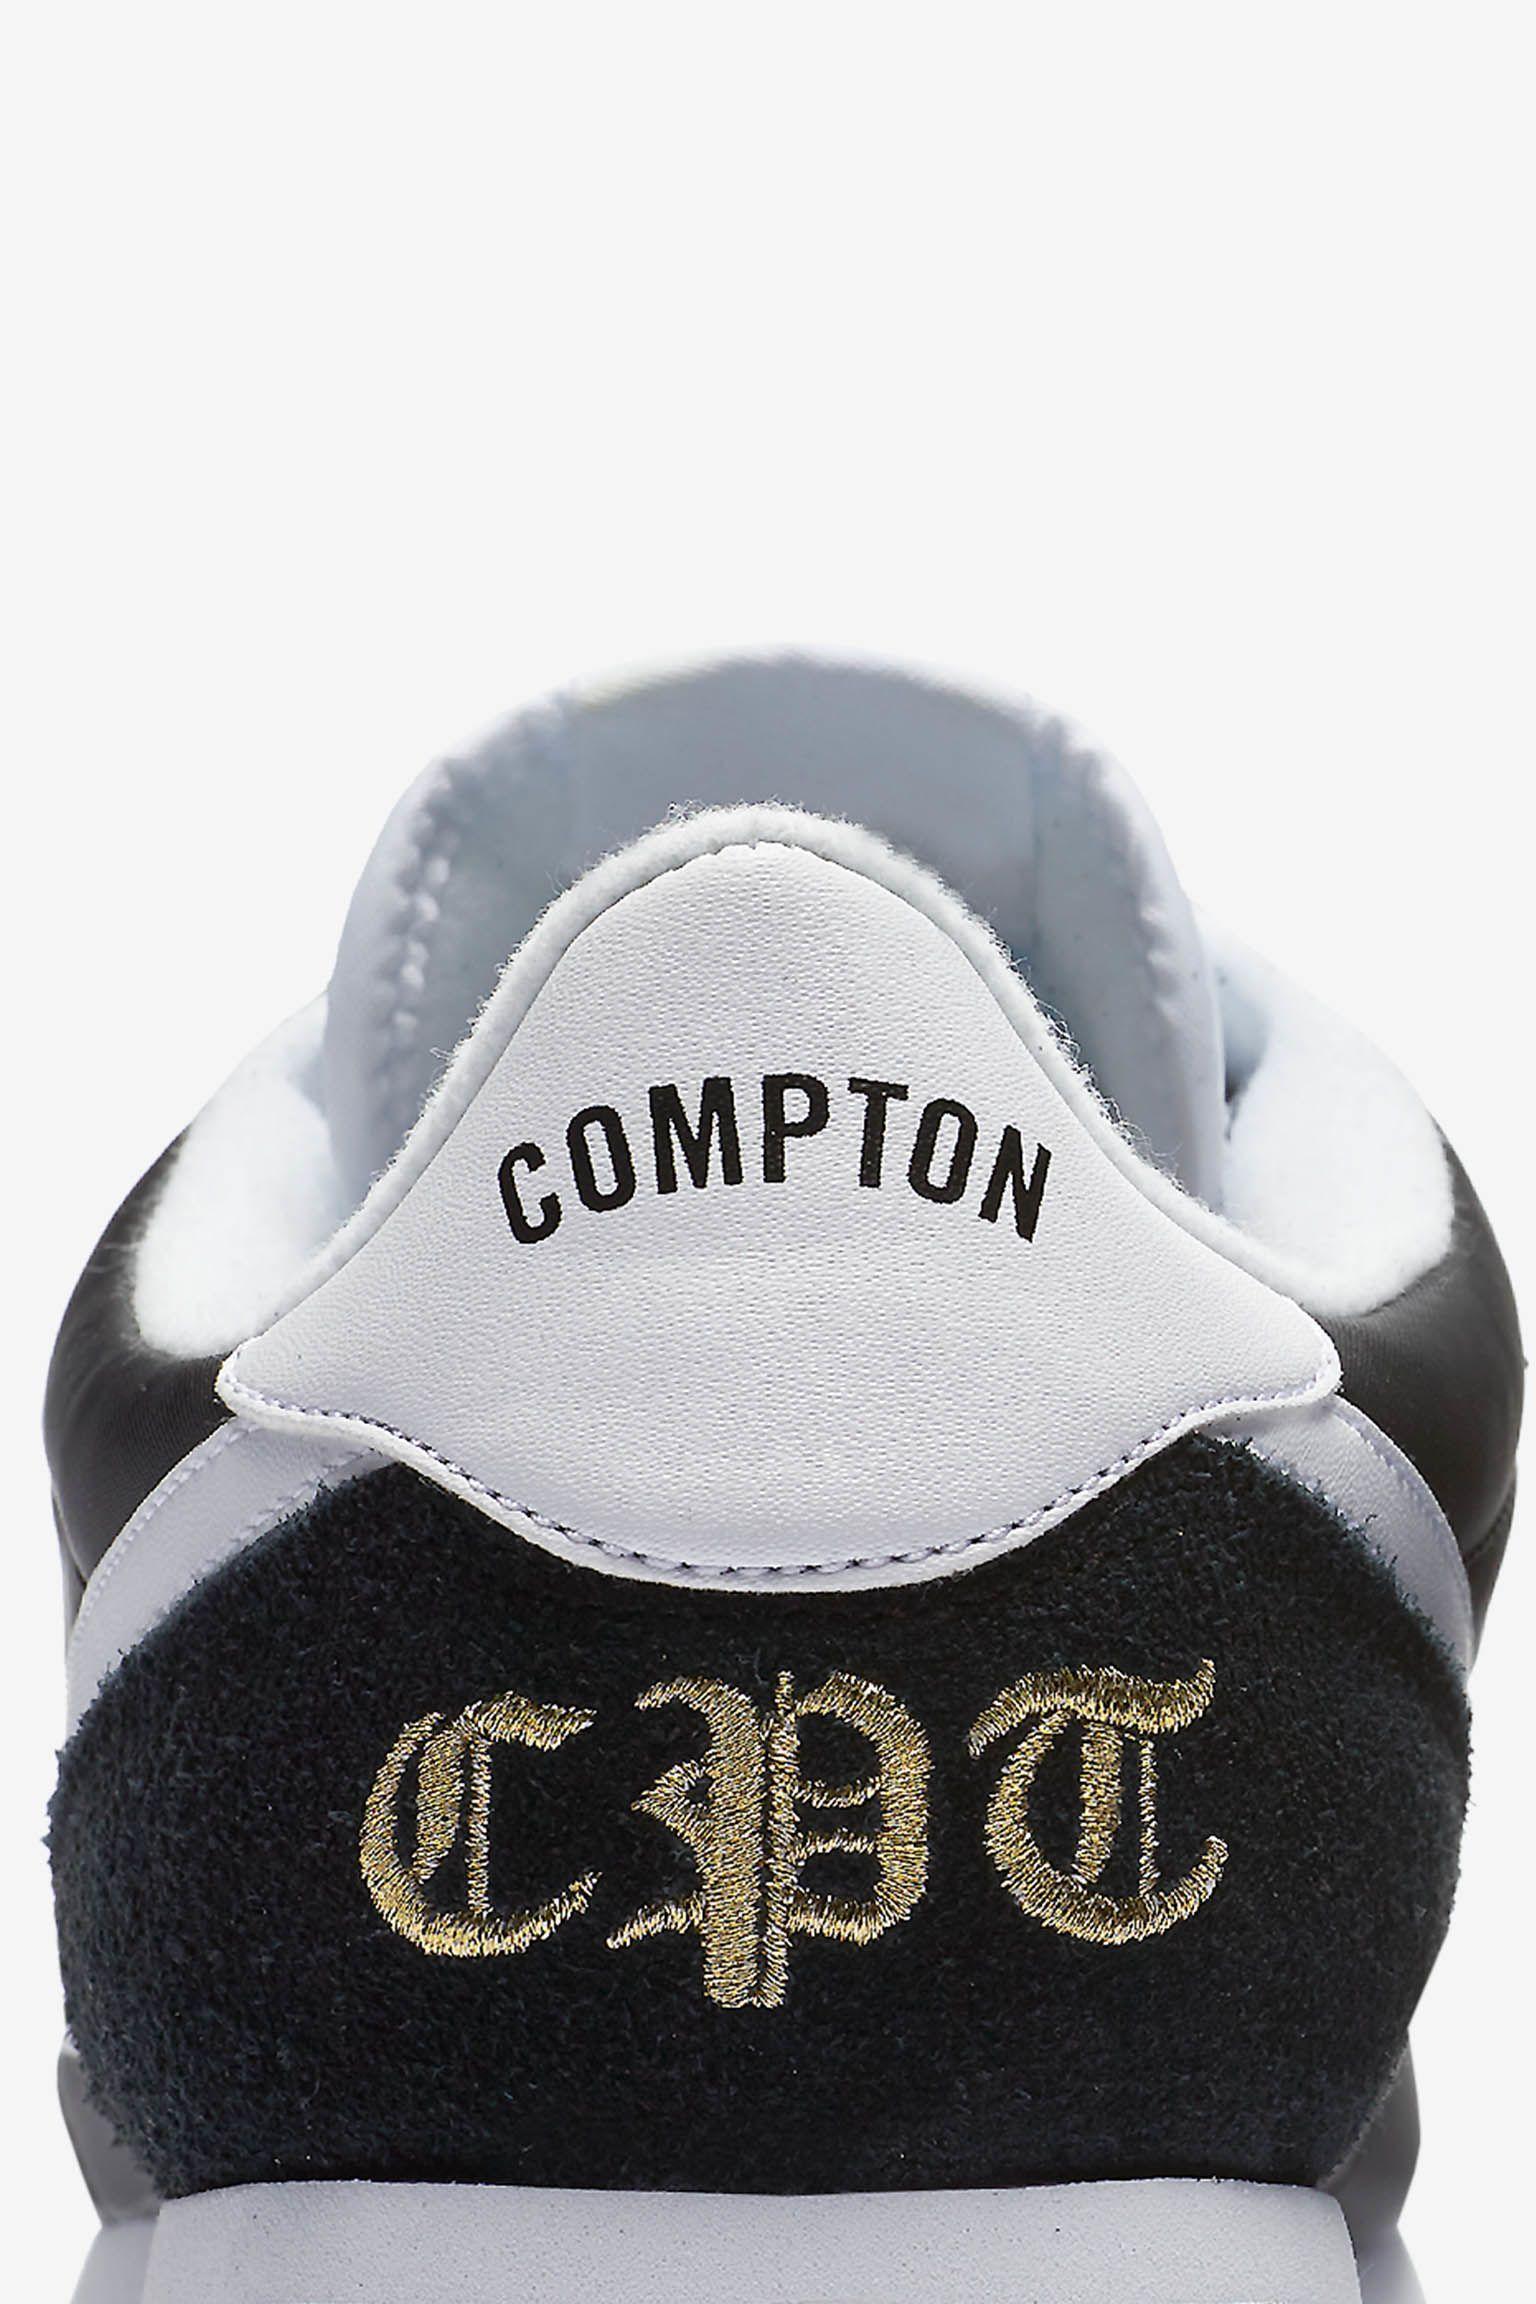 Nike Cortez Basic Nylon 'Compton' Release Date